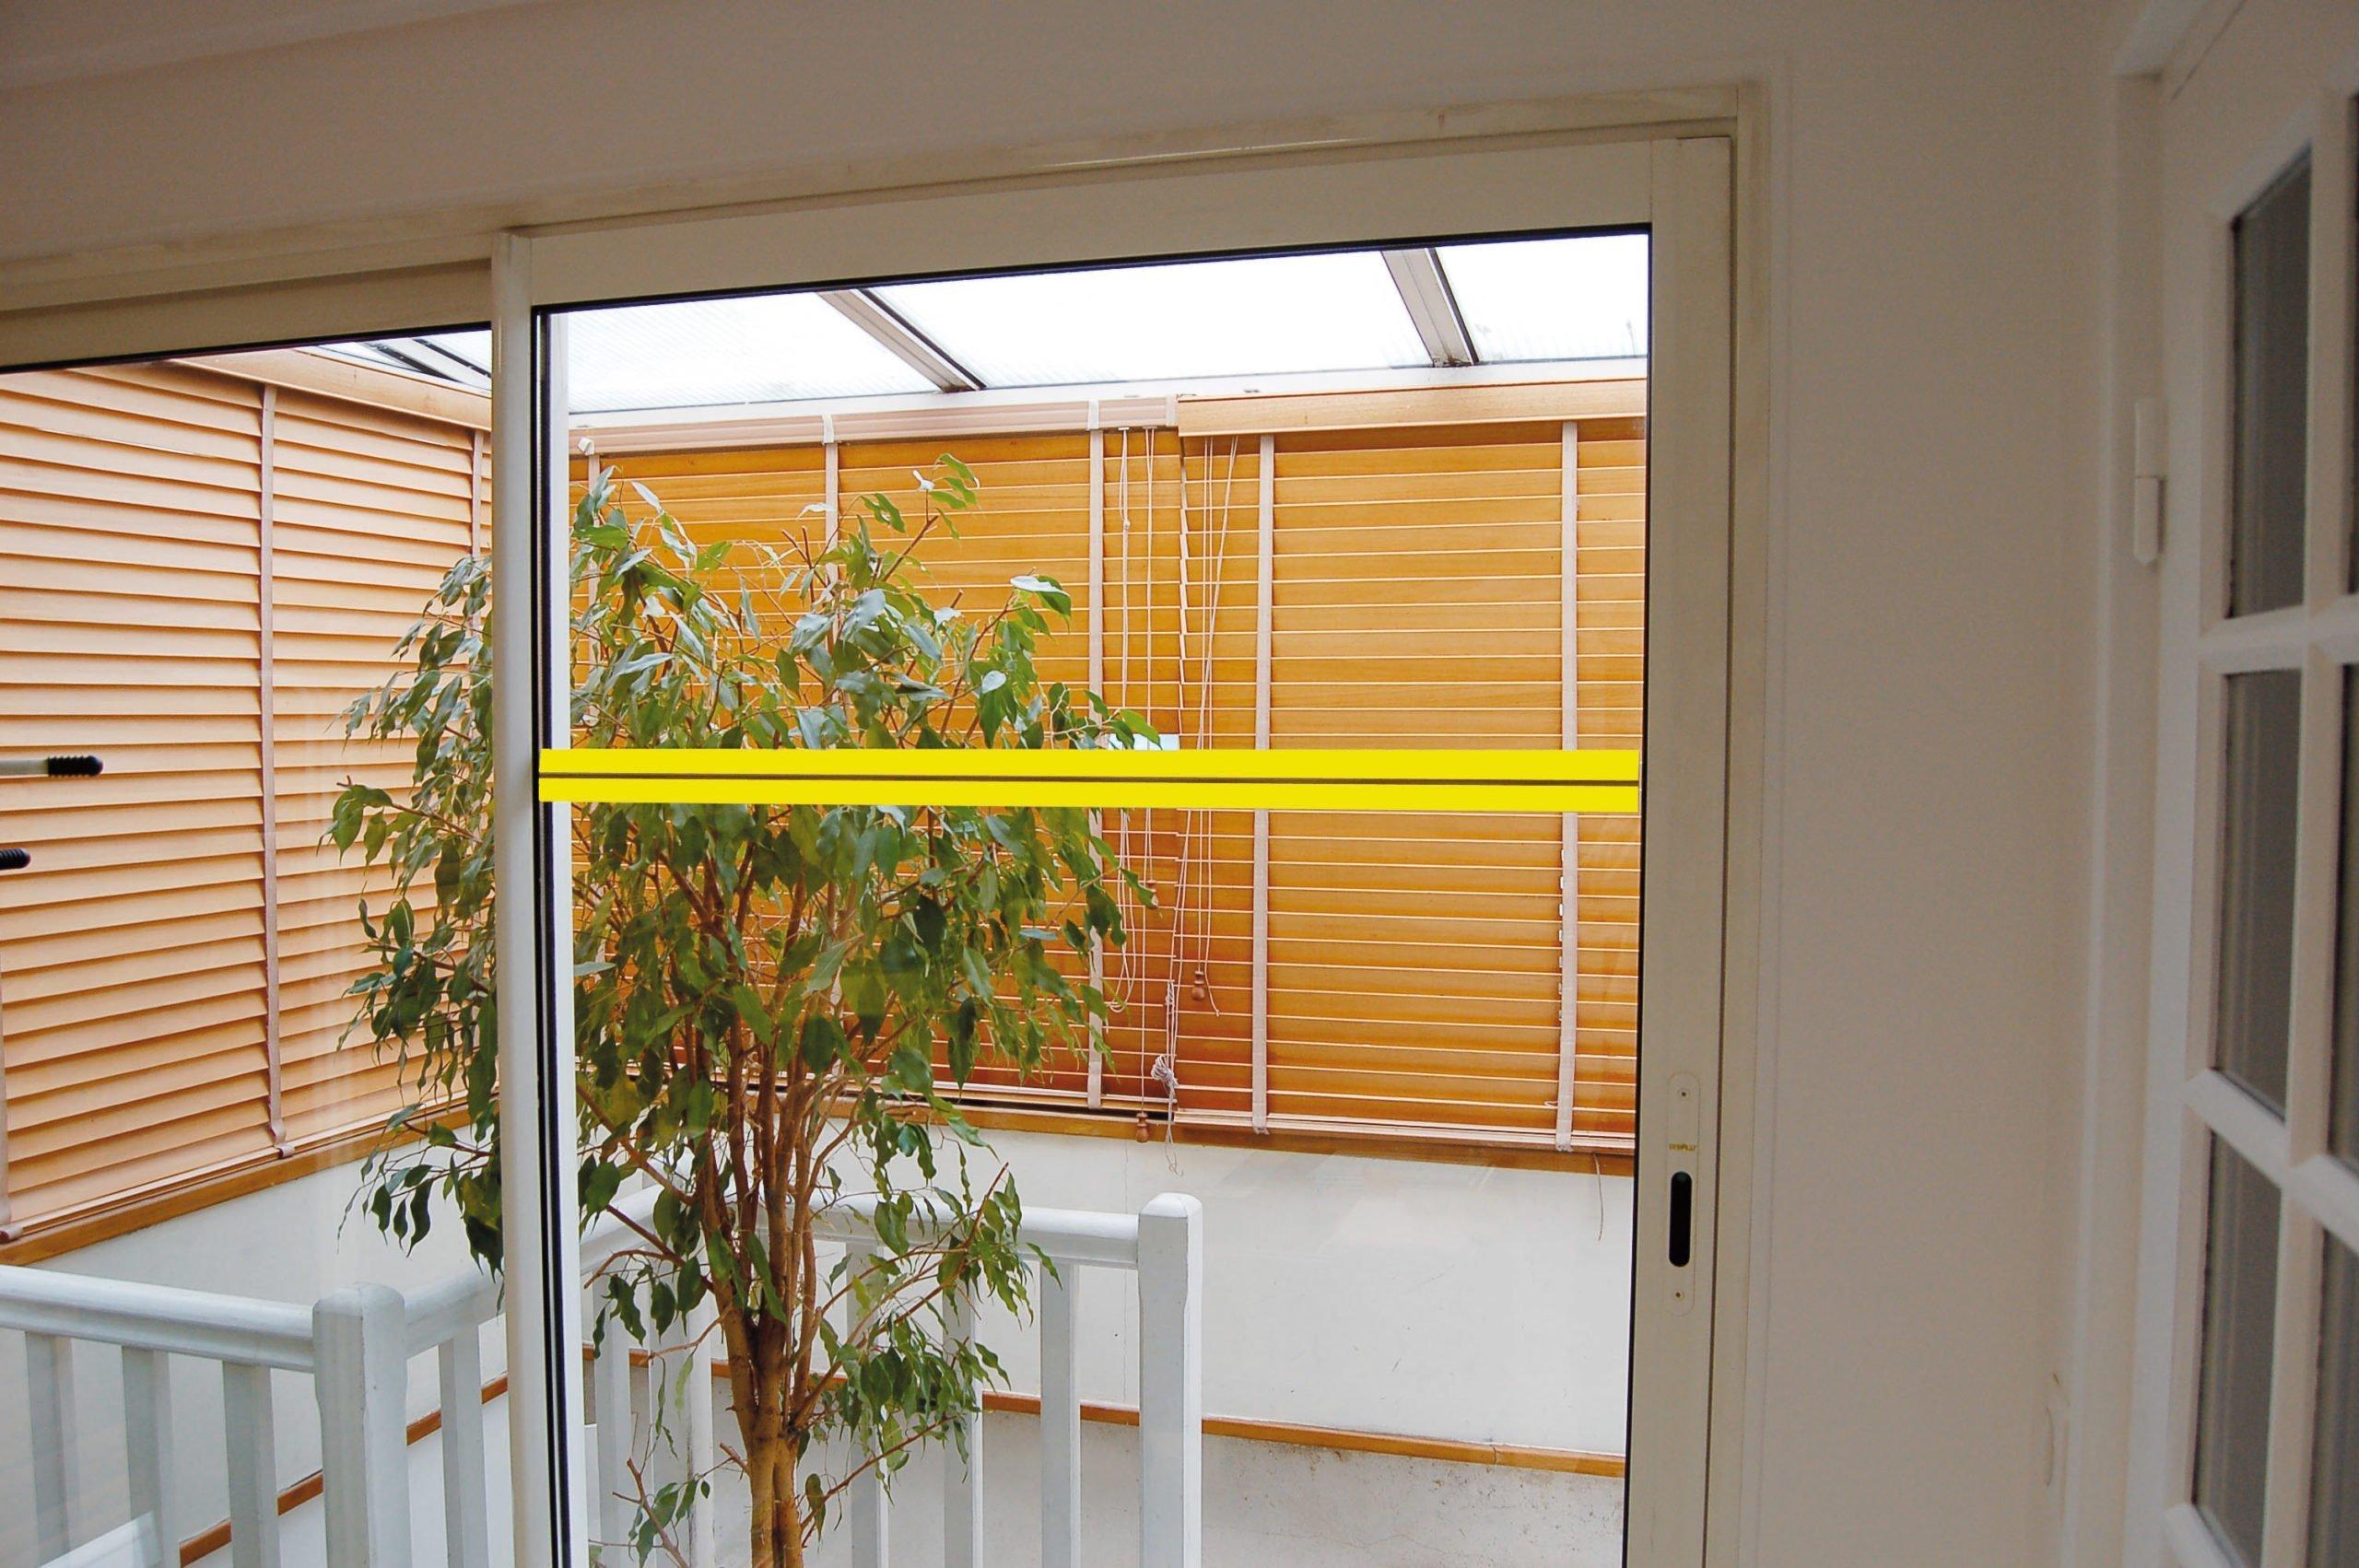 Window marking